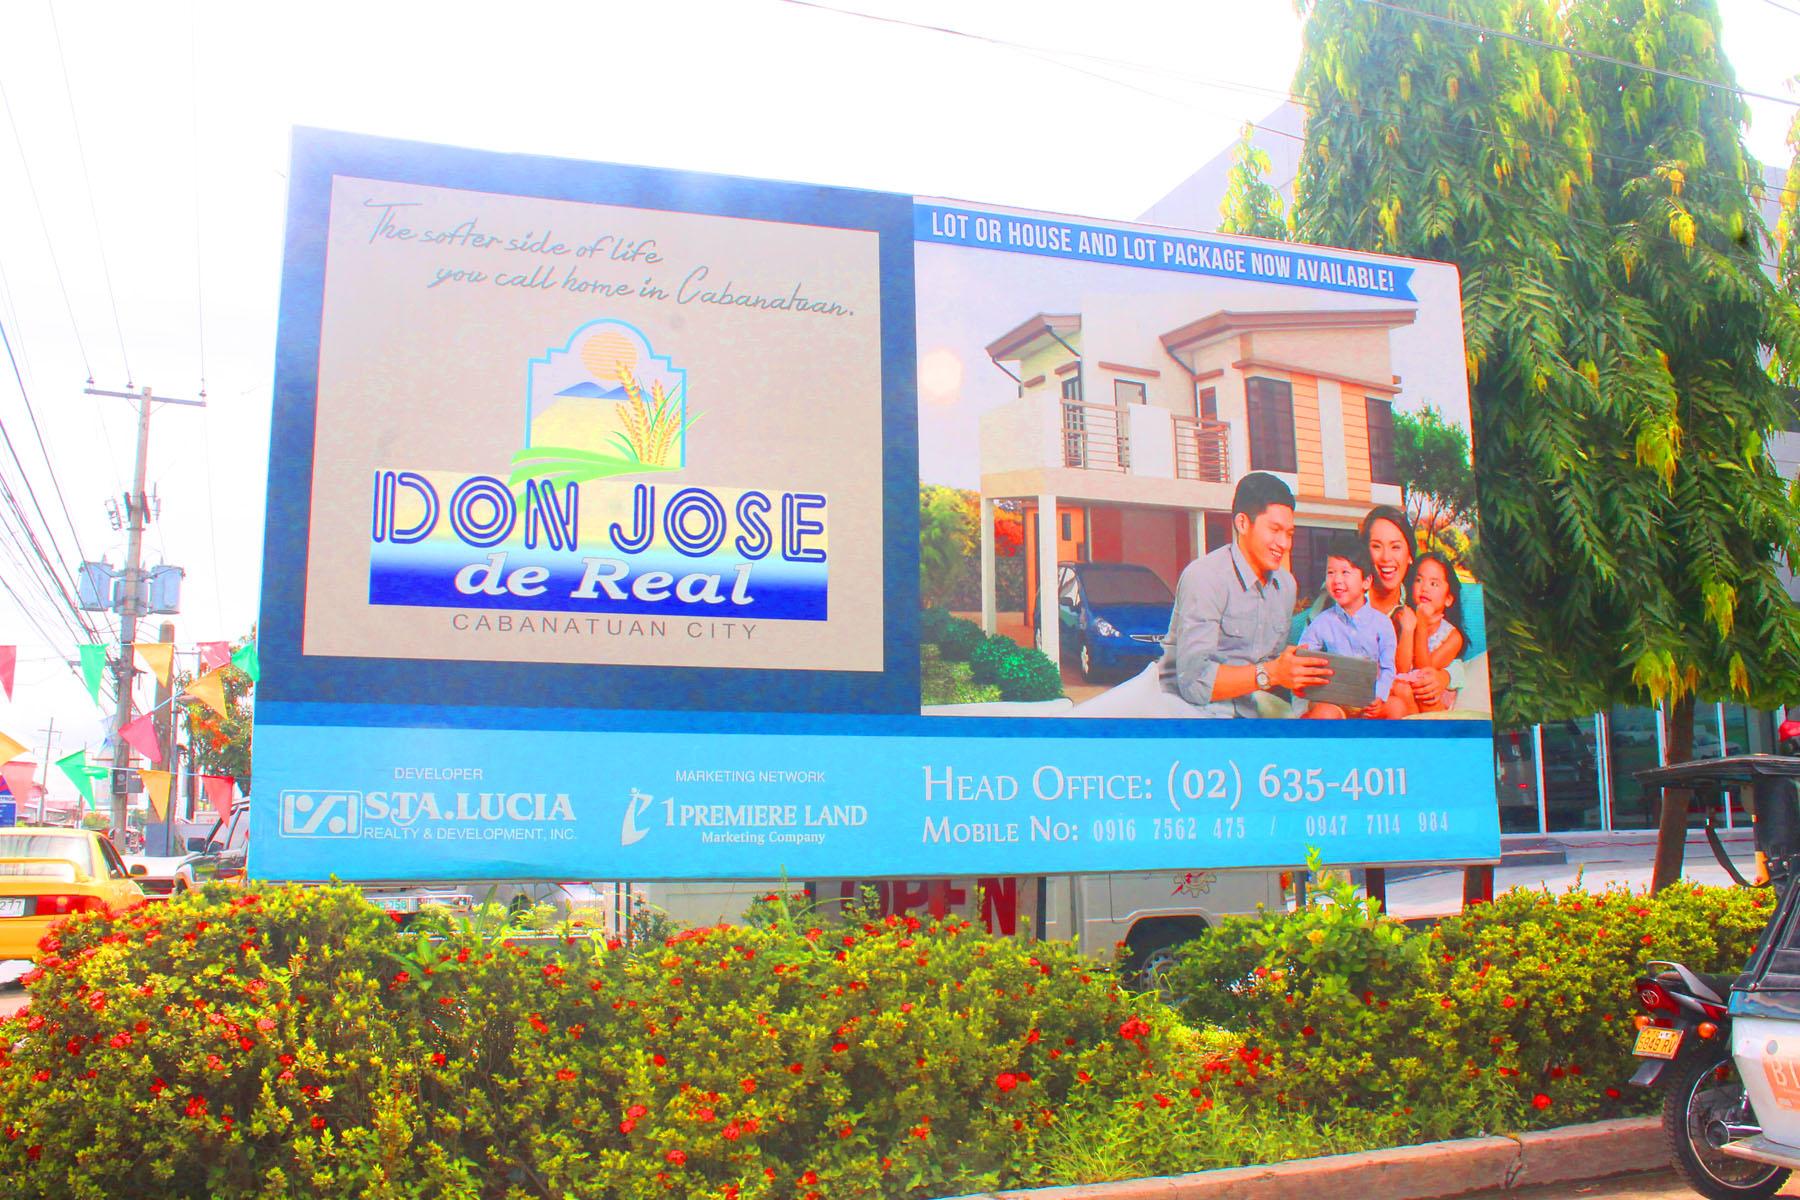 Don_Jose_De_Real_Cabanatuan_Nueva_Ecija_Residential_Lot_for_Sale_14.jpg